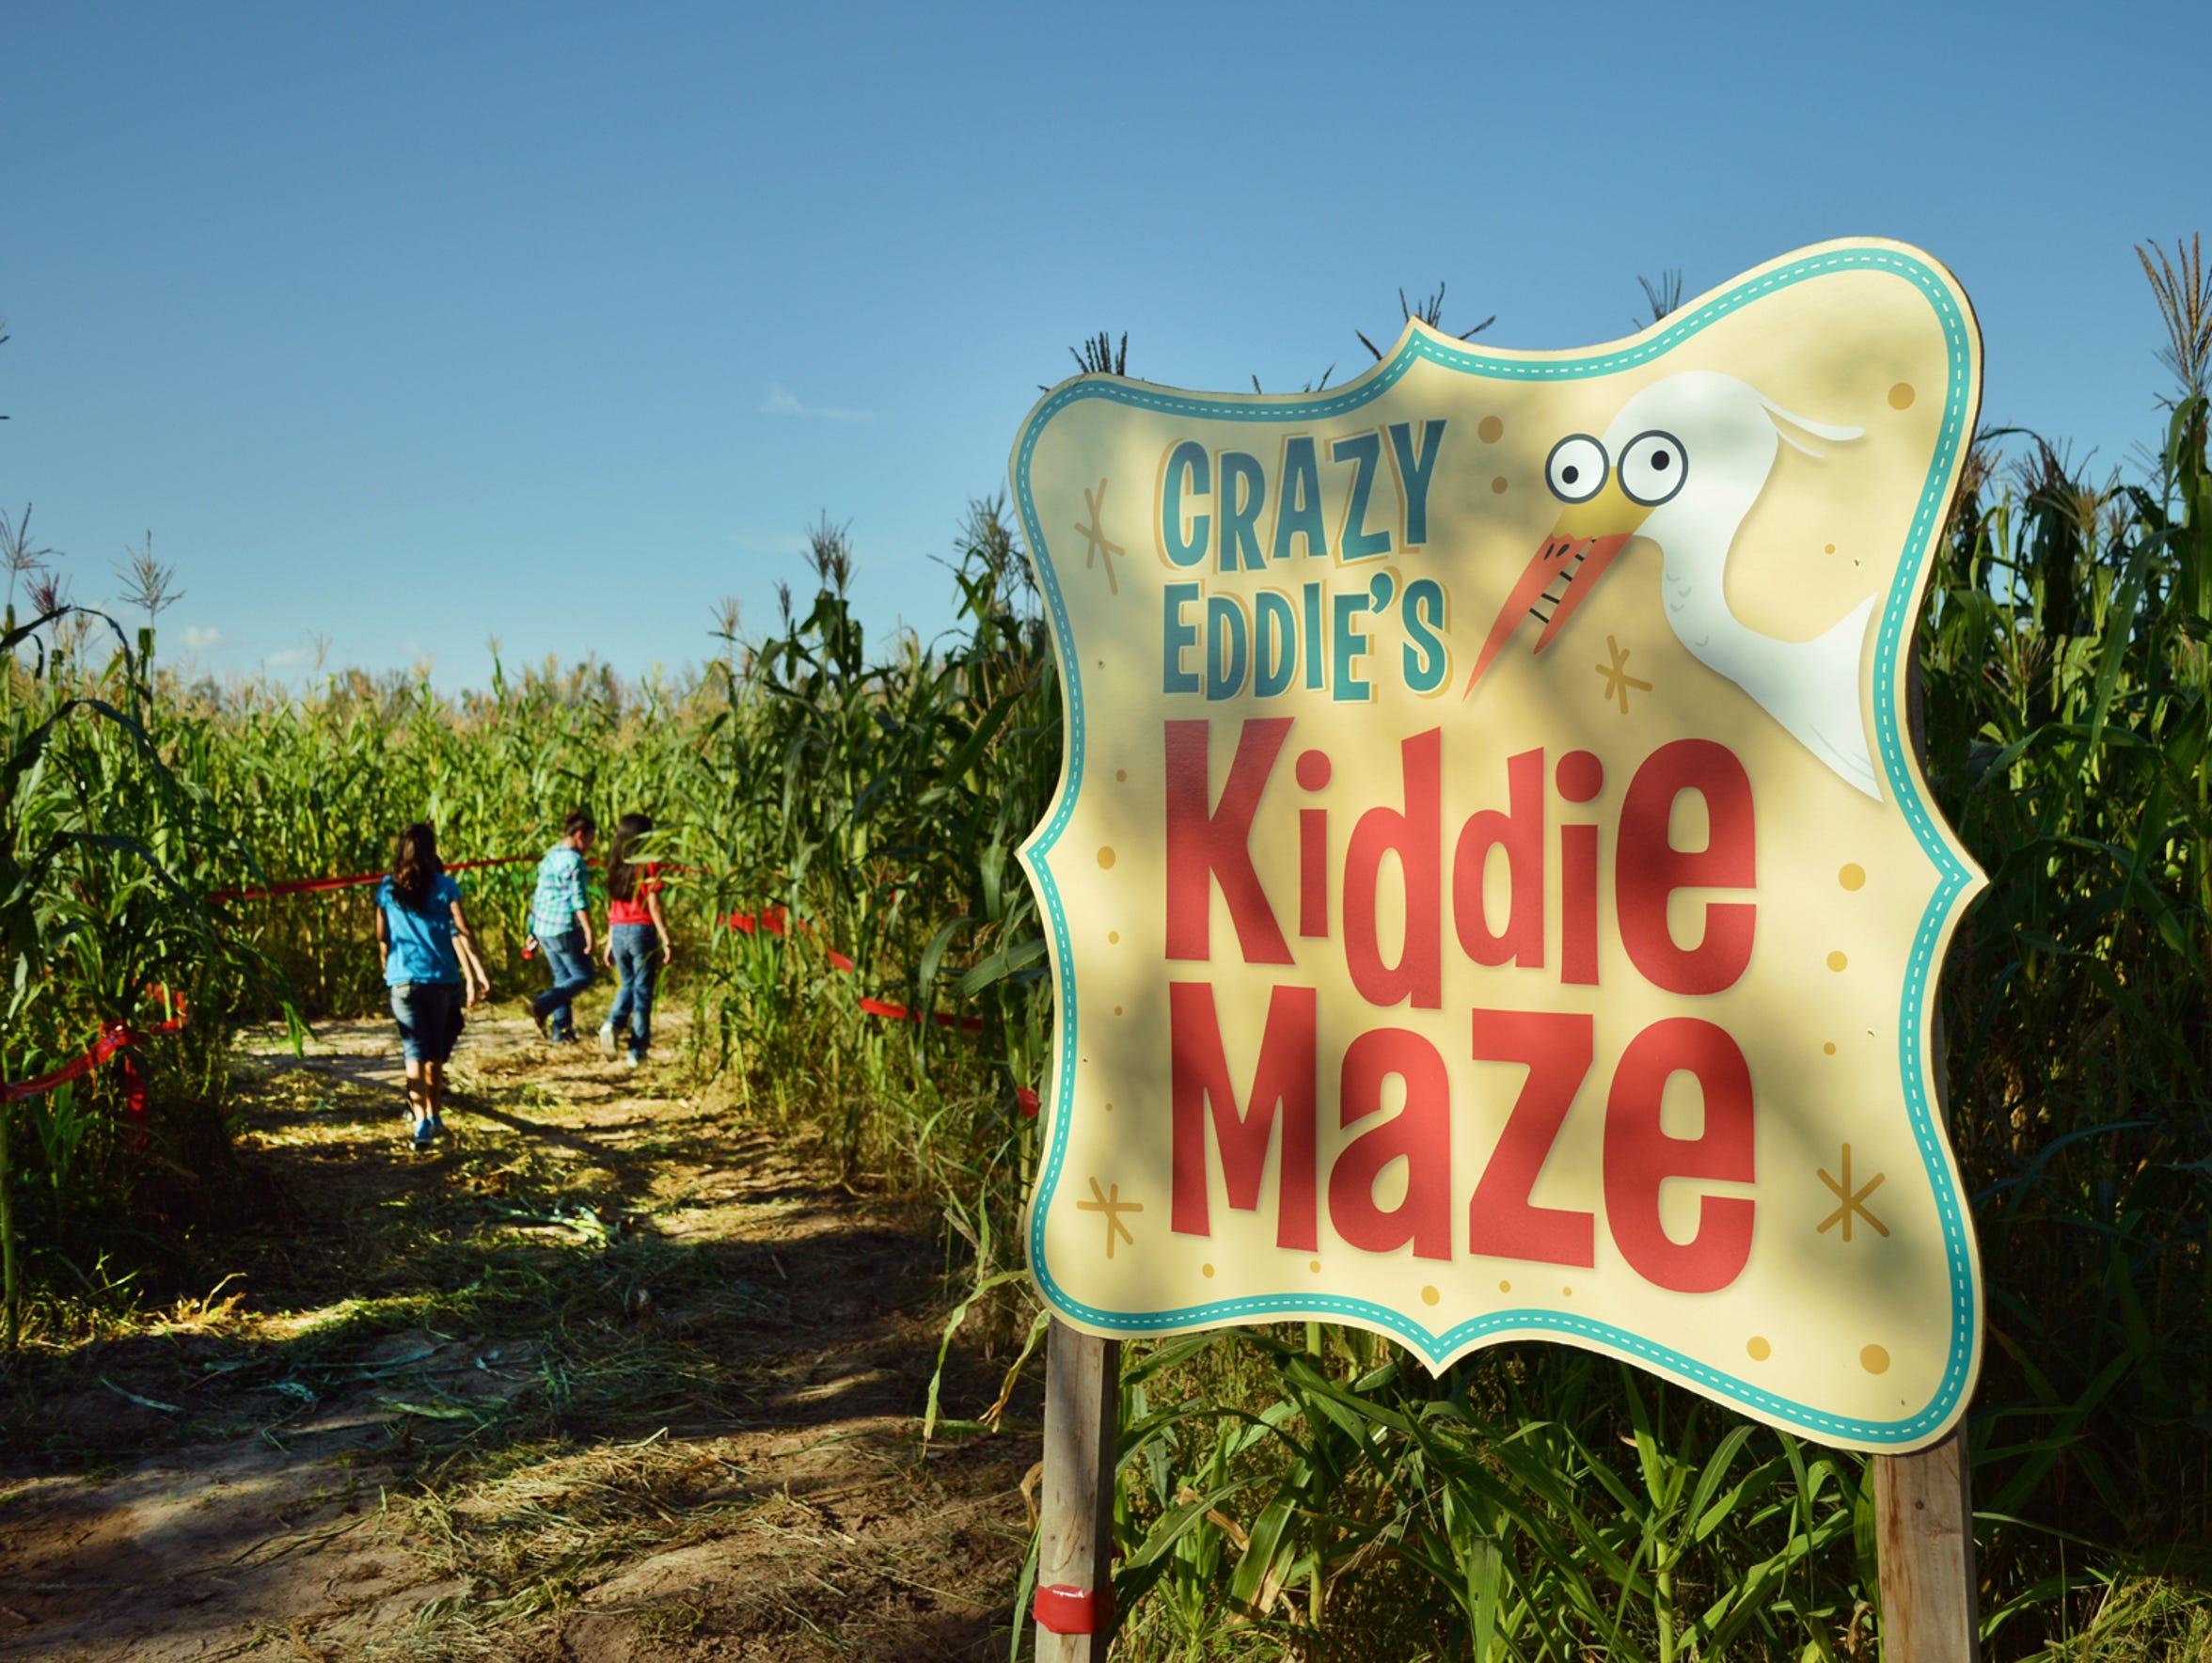 Eddie the Egret Kiddie Maze is geared towards younger